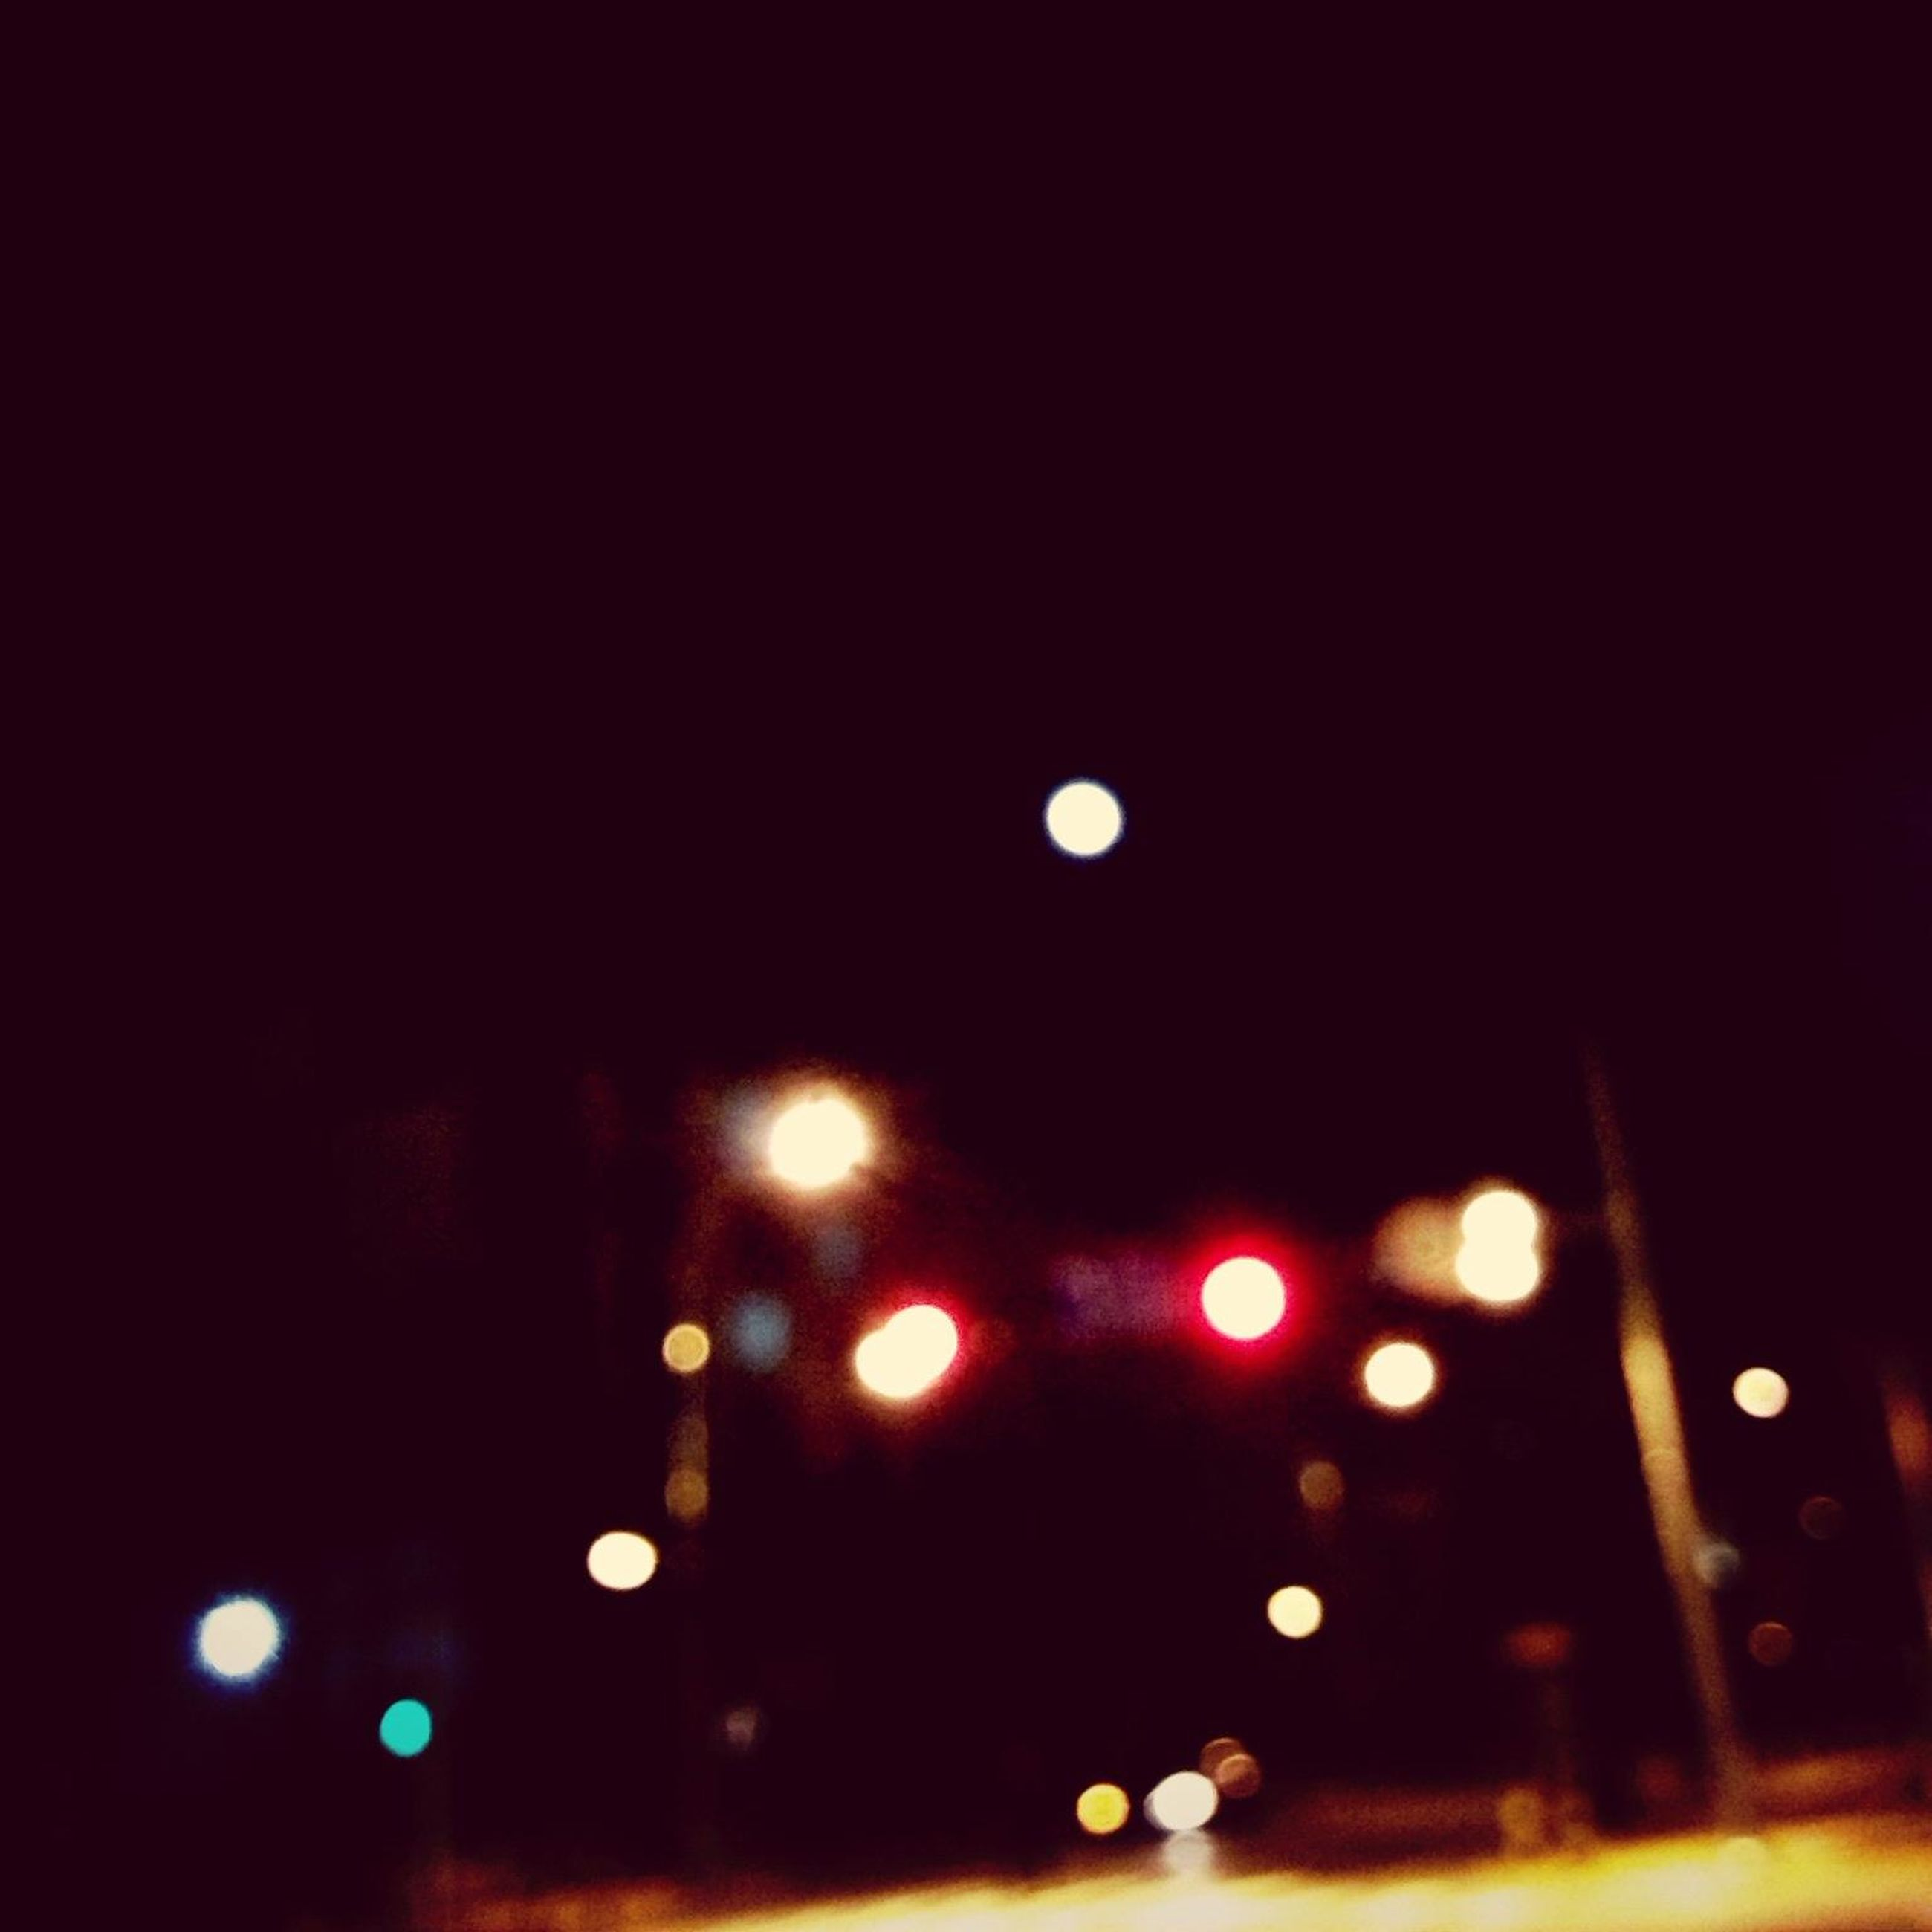 illuminated, night, defocused, transportation, lighting equipment, car, light - natural phenomenon, glowing, dark, no people, copy space, street, road, indoors, light, street light, land vehicle, circle, motion, close-up